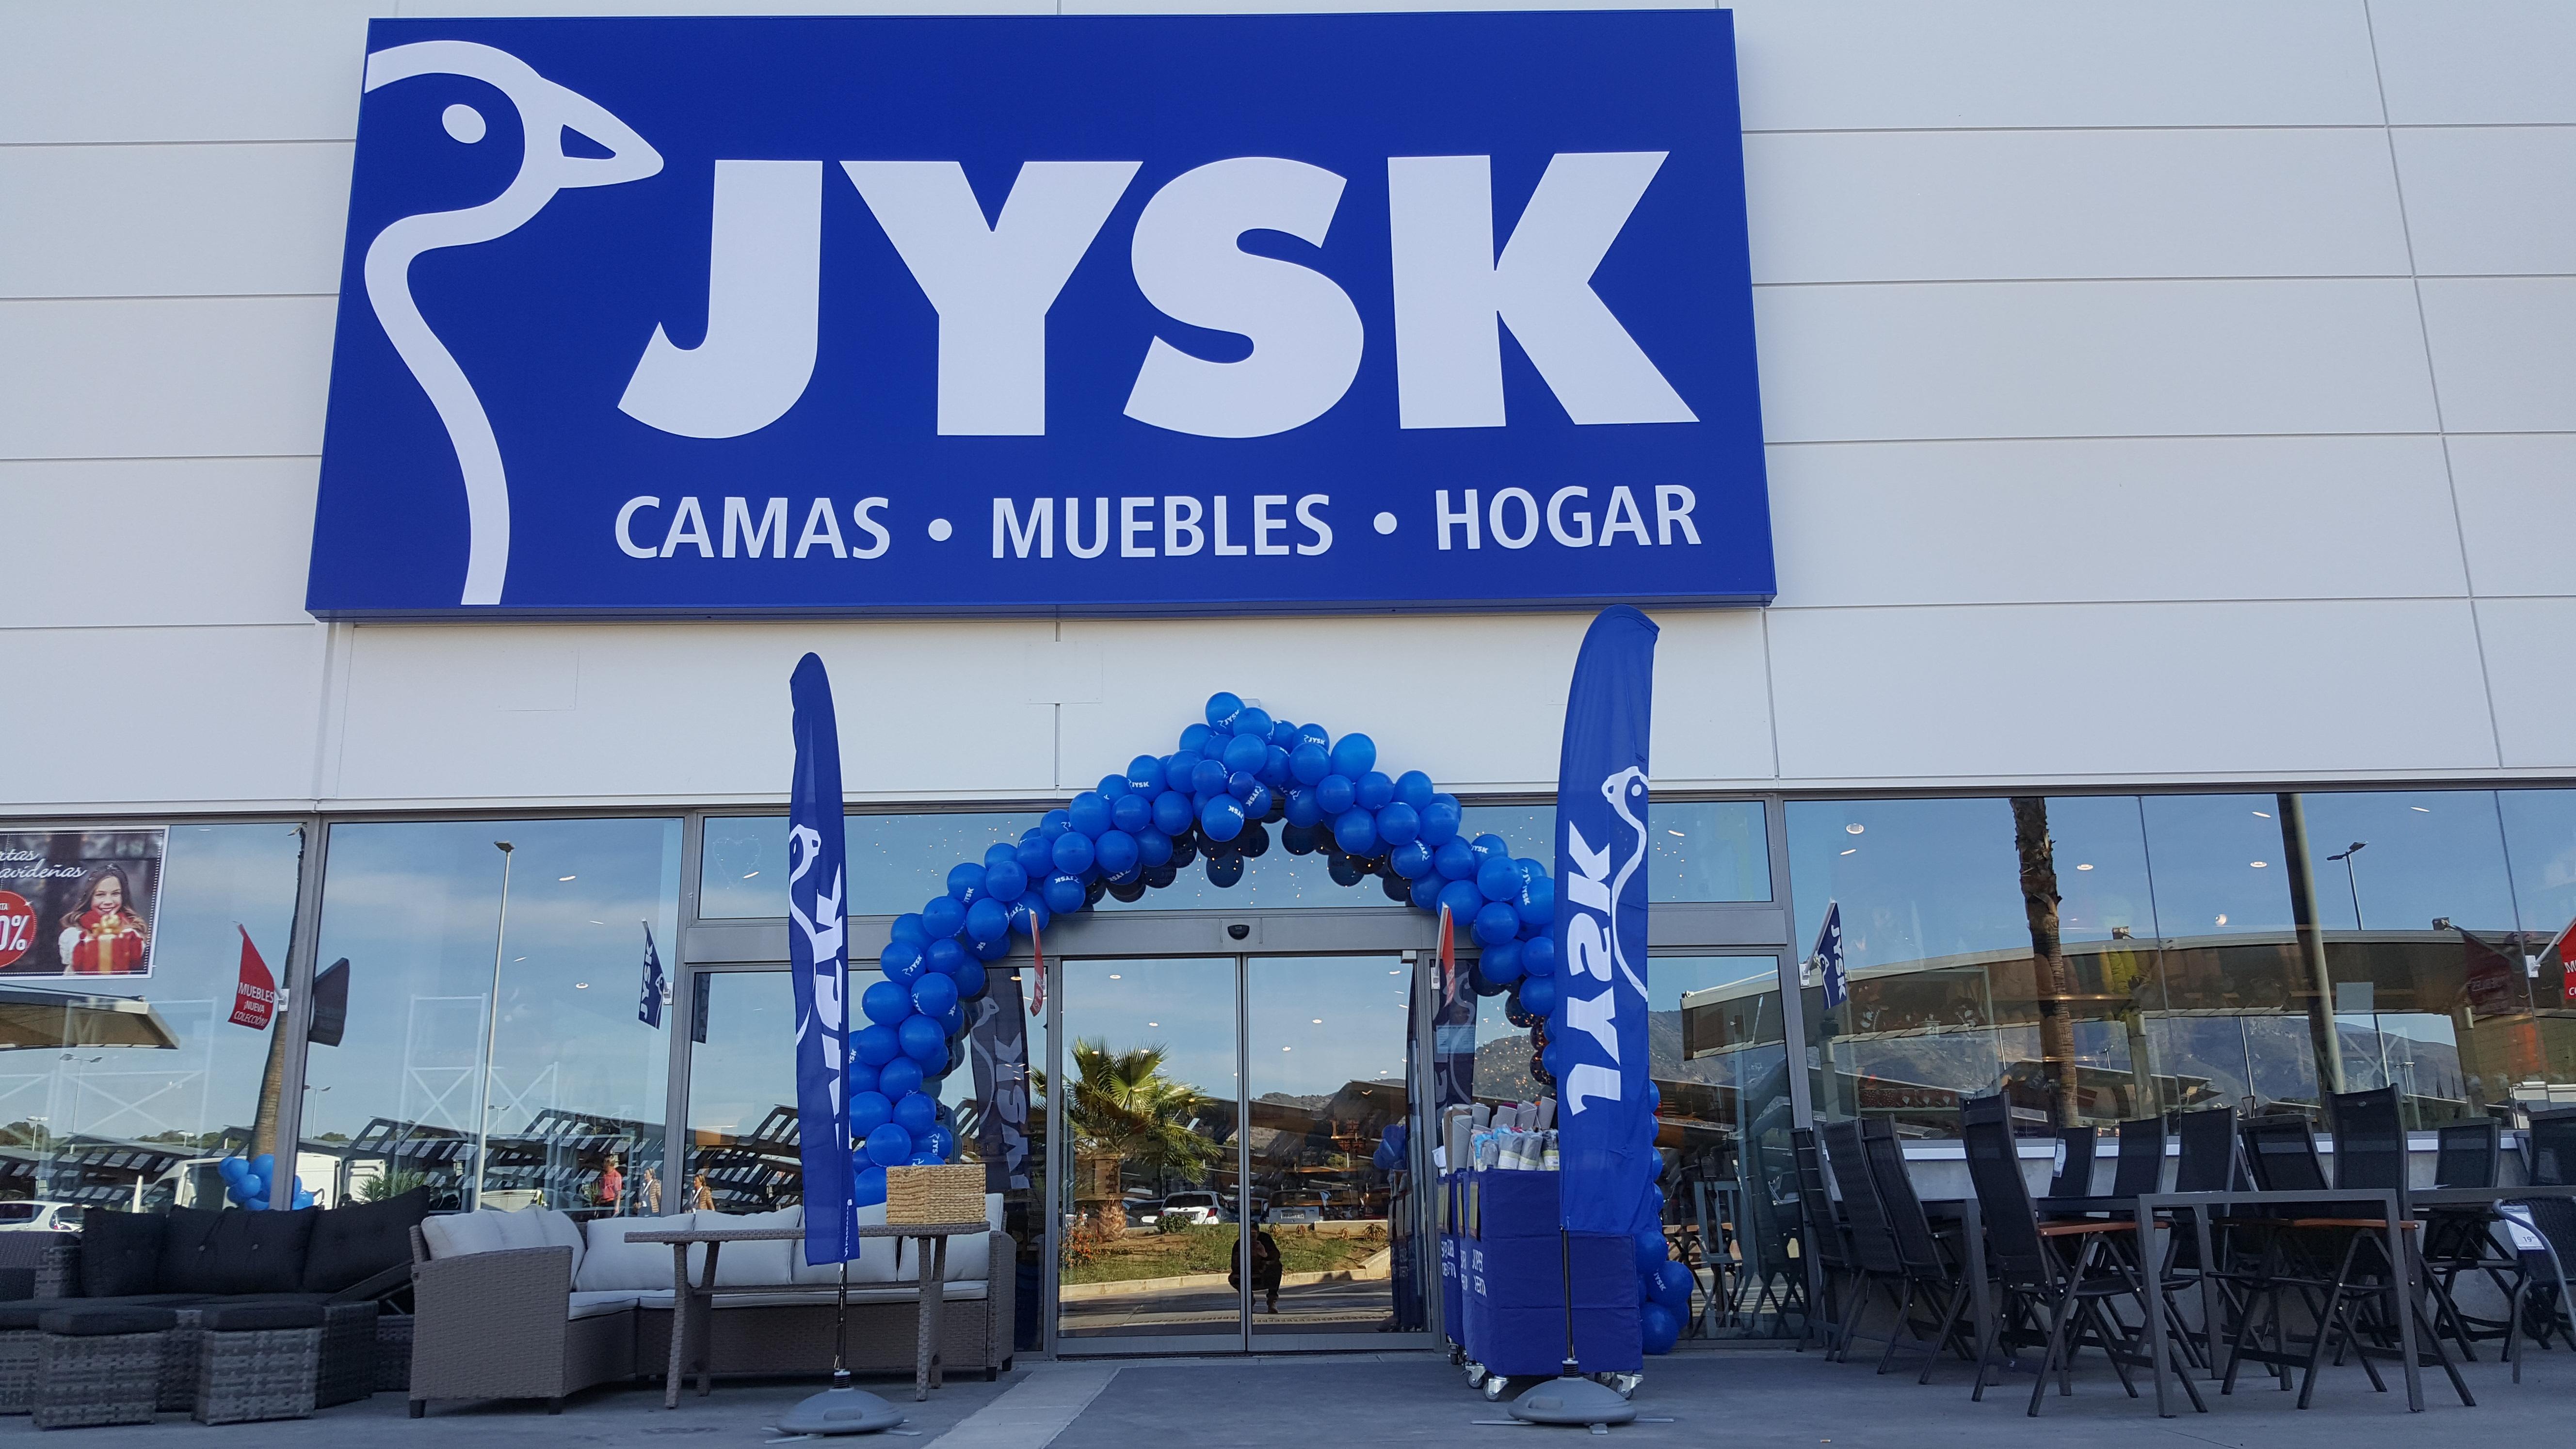 Jysk Parque Comercial Bah A Azul M Laga # Muebles Malaga Nostrum